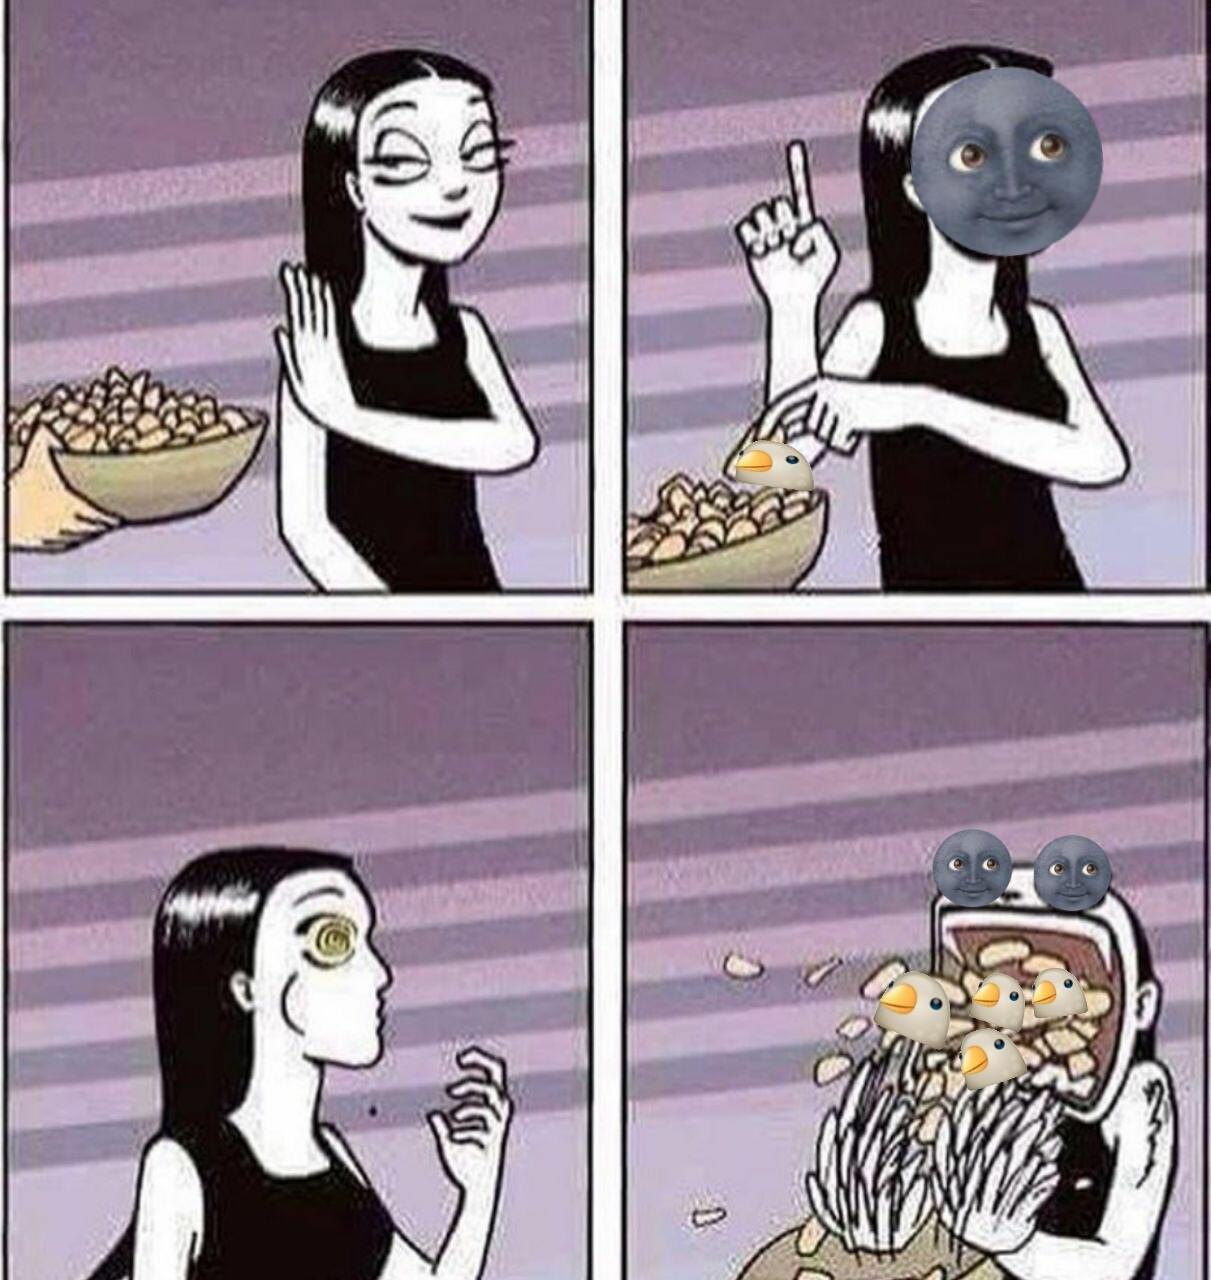 mmmmm....bono sto pikkiono - meme